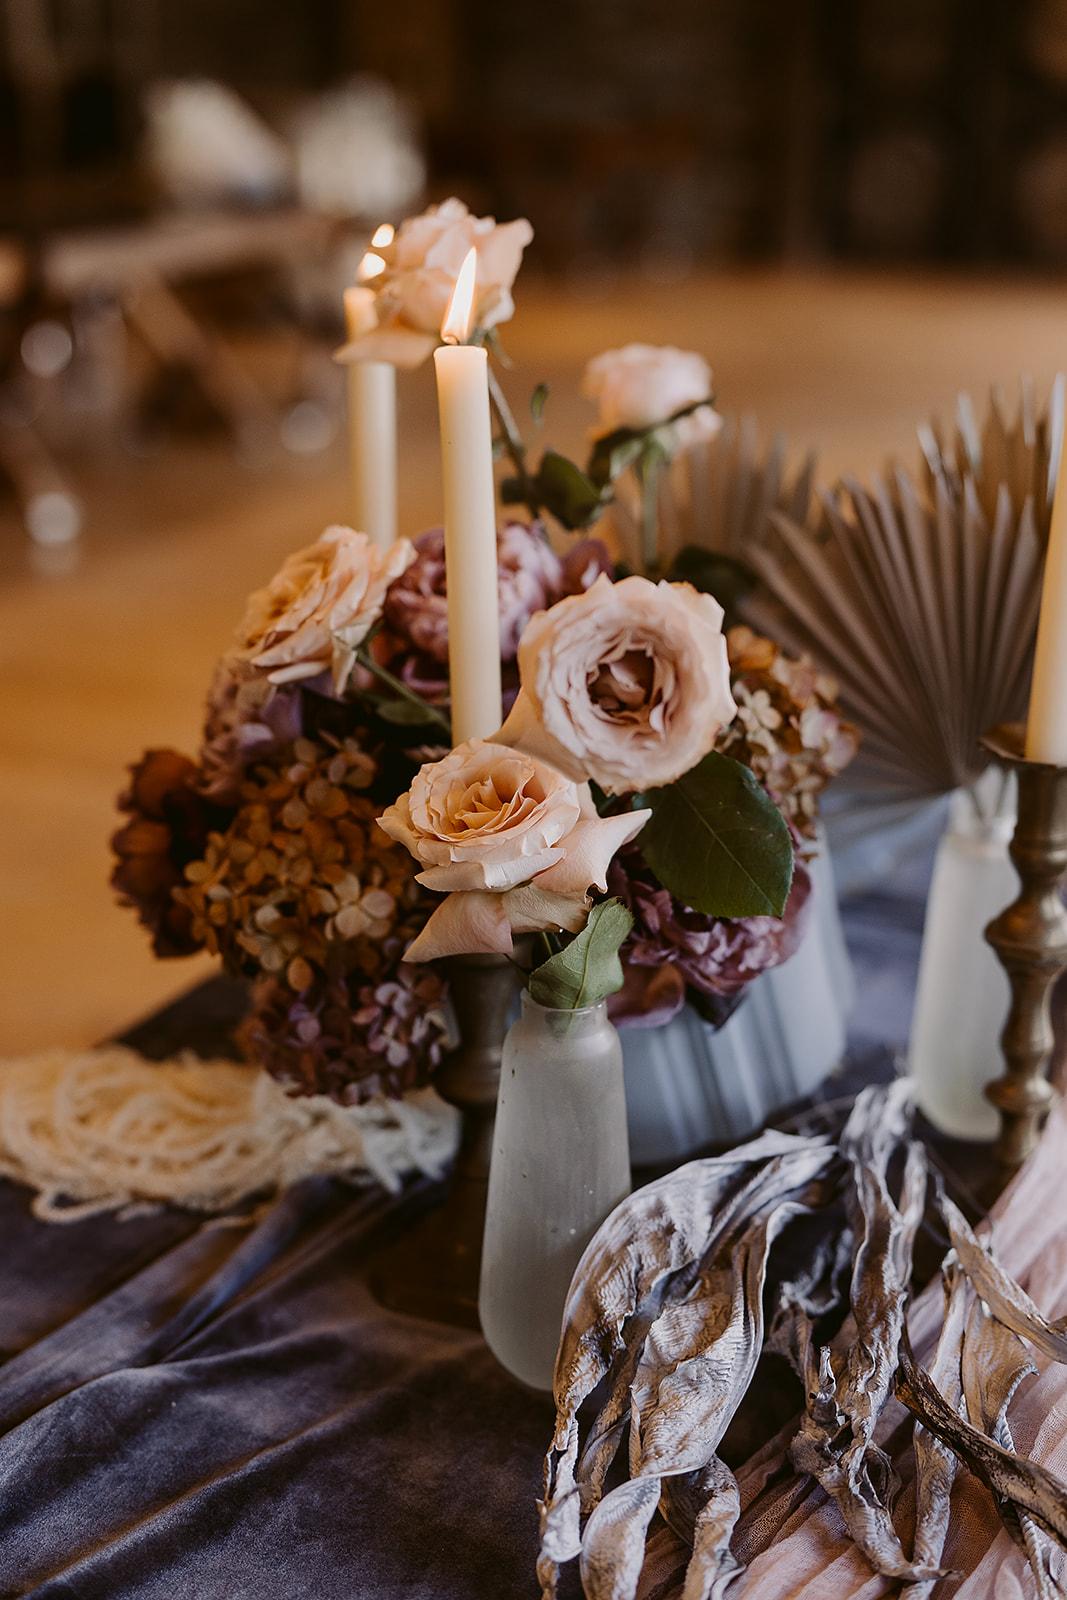 Immerse_Yarra_Valley_Same_Sex_Wedding_-_Ashleigh_Haase_Photography-725.jpg